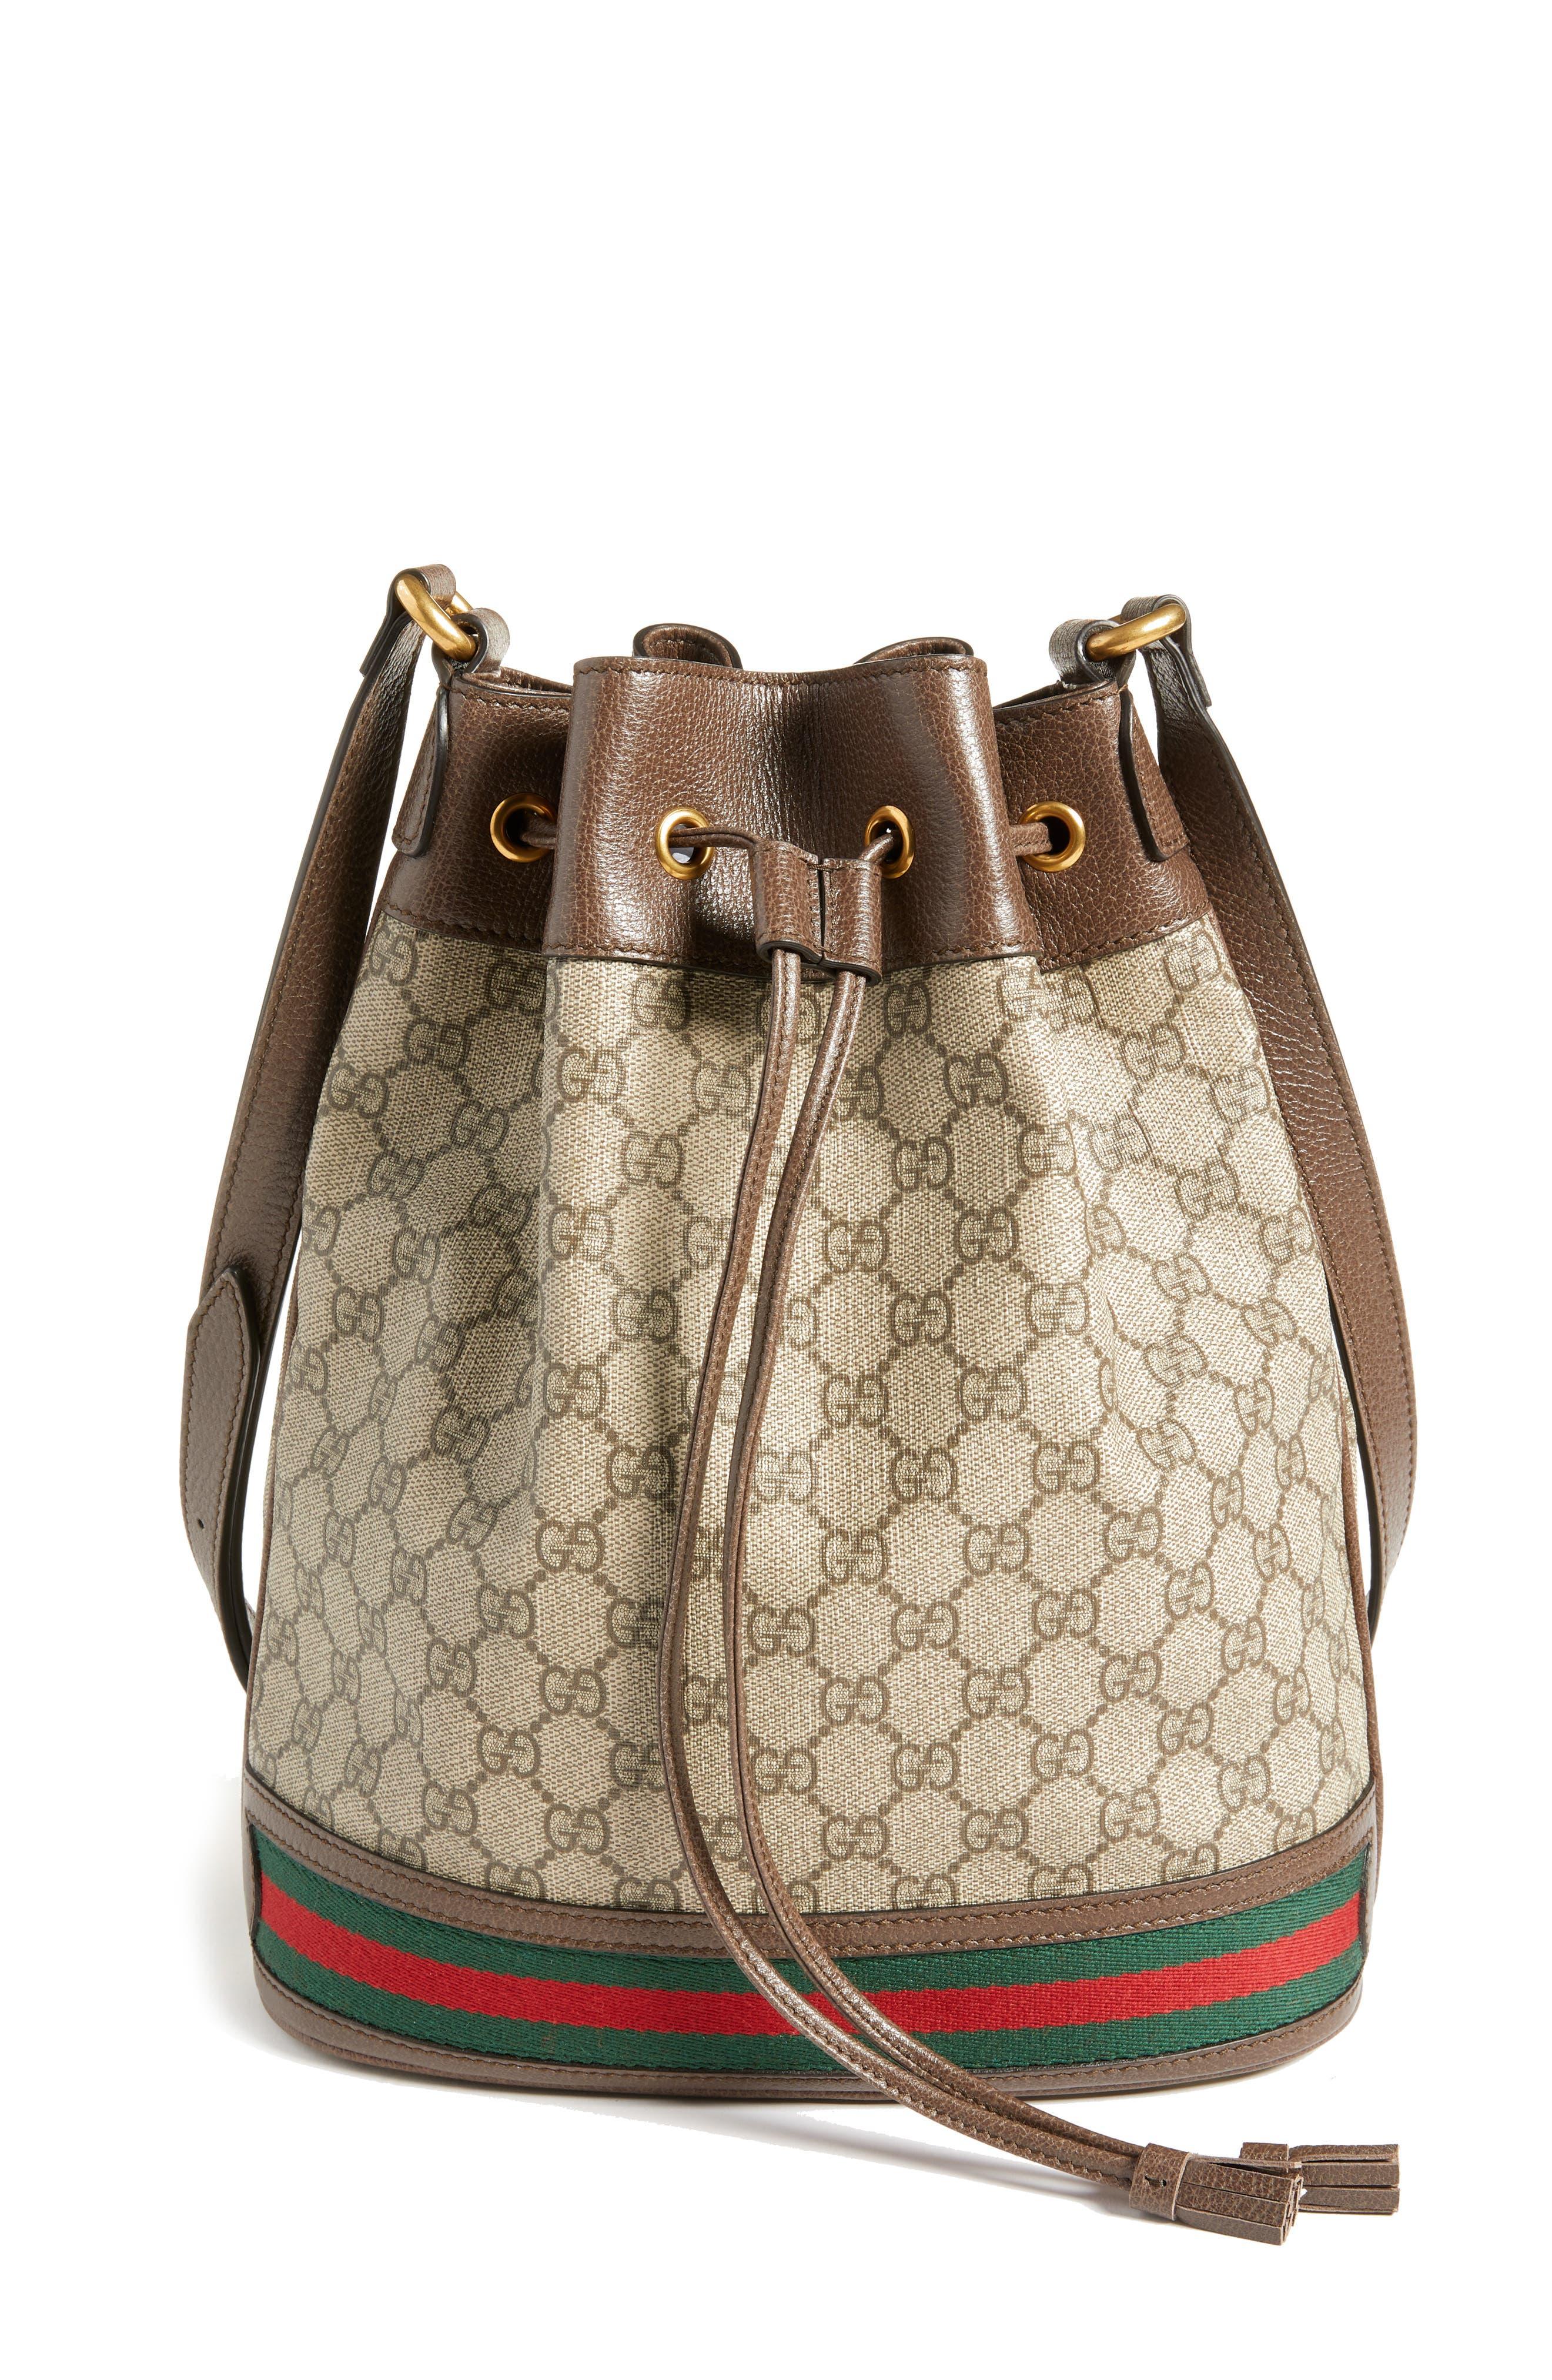 Ophidia GG Supreme Bucket Shoulder Bag,                             Main thumbnail 1, color,                             250